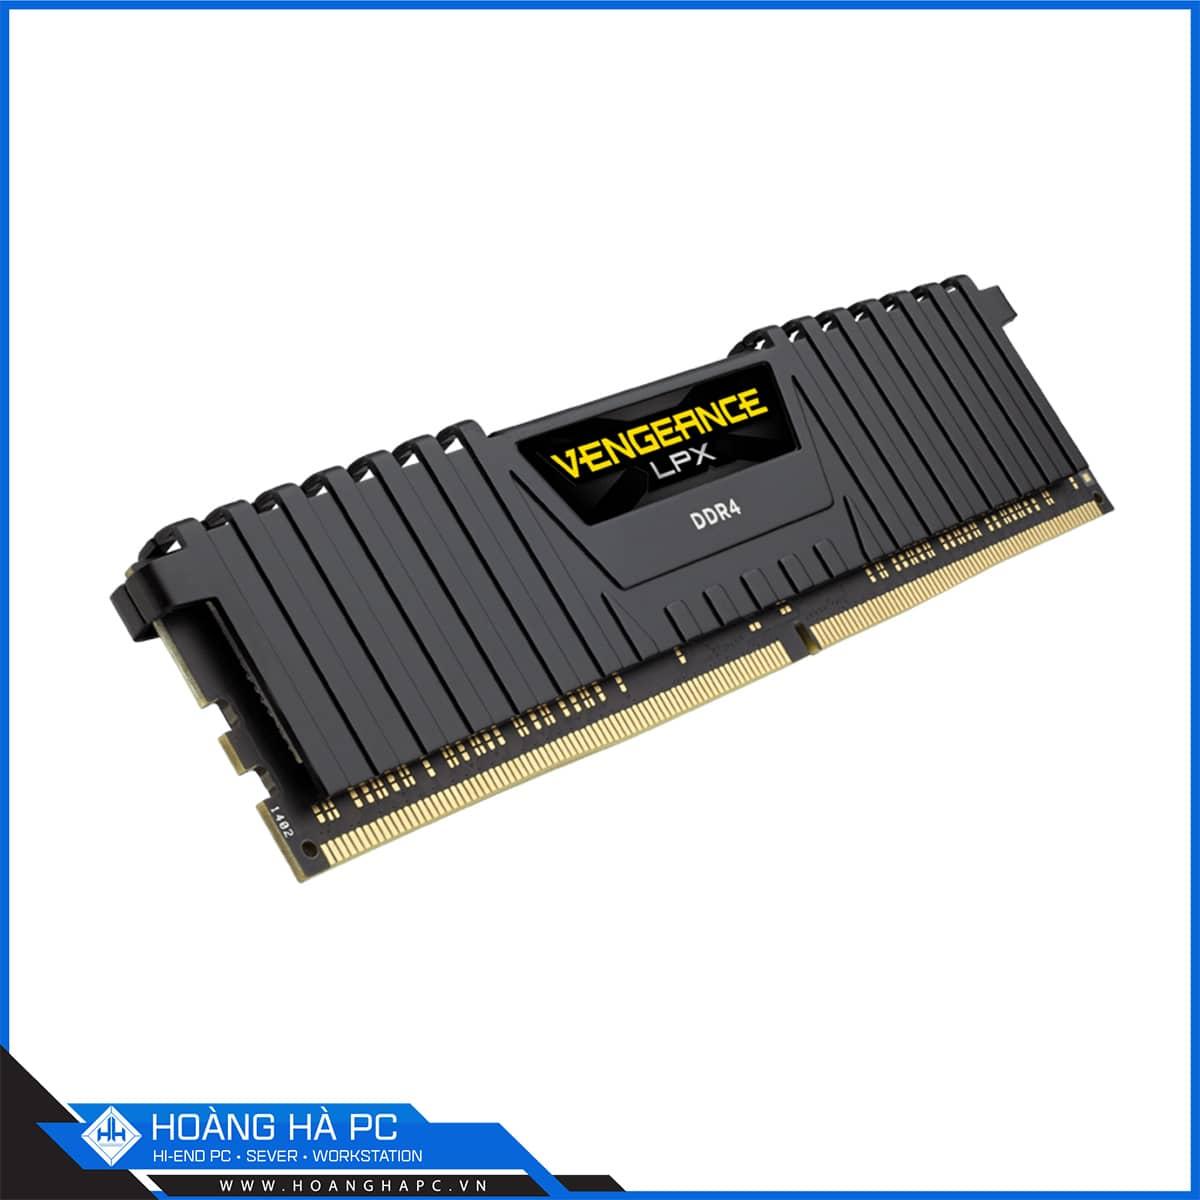 Corsair Vengeance LPX 16GB DDR4 3200MH